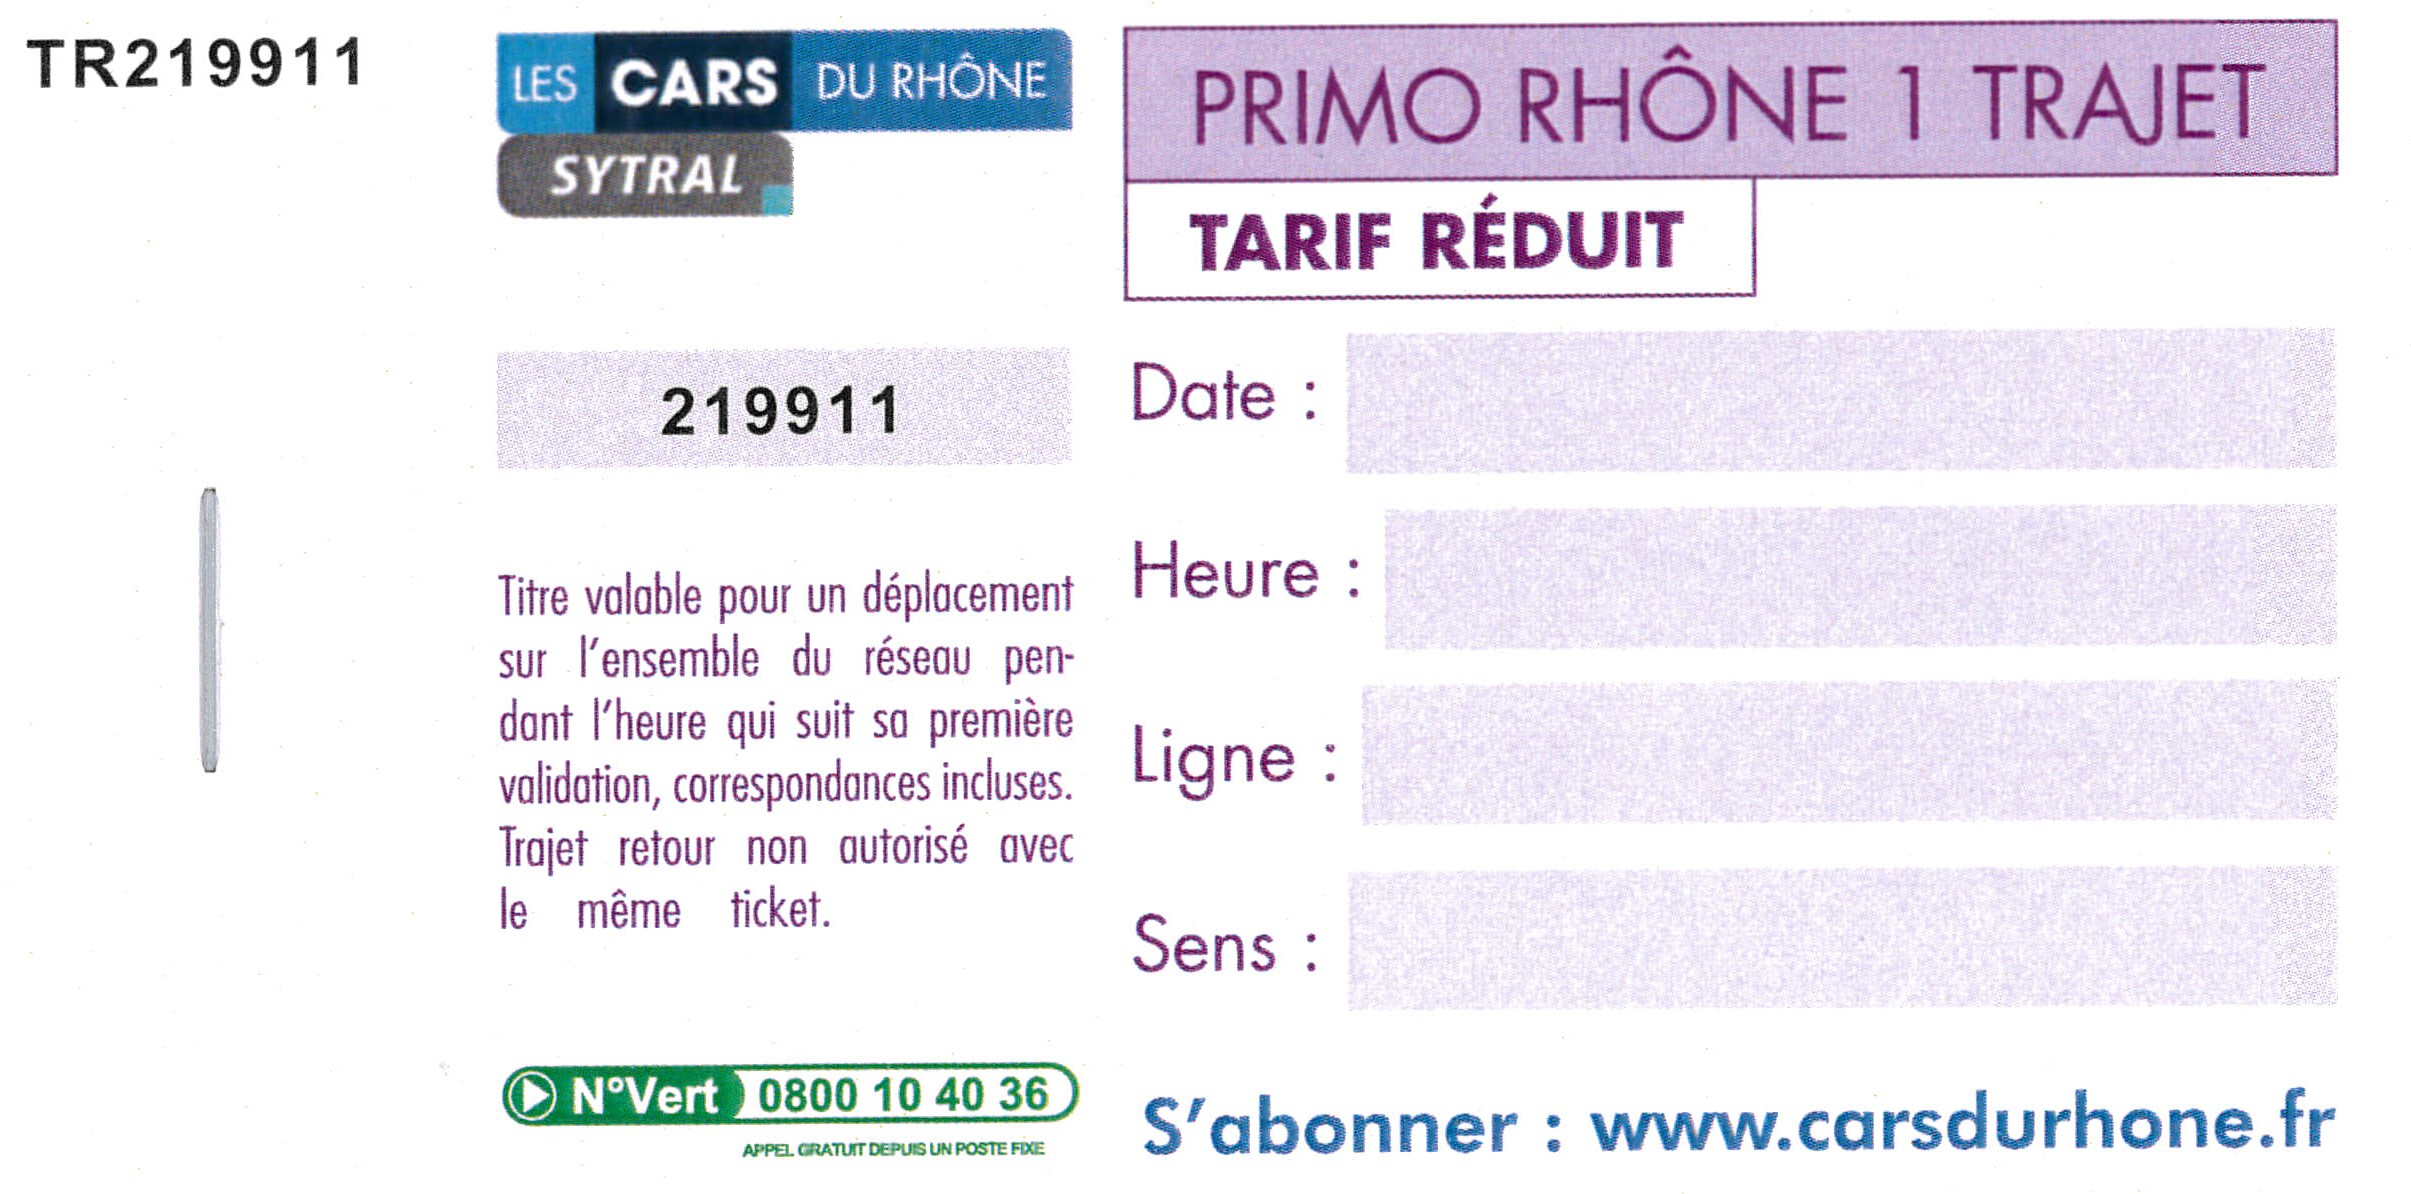 Ticket-1-trajet_large